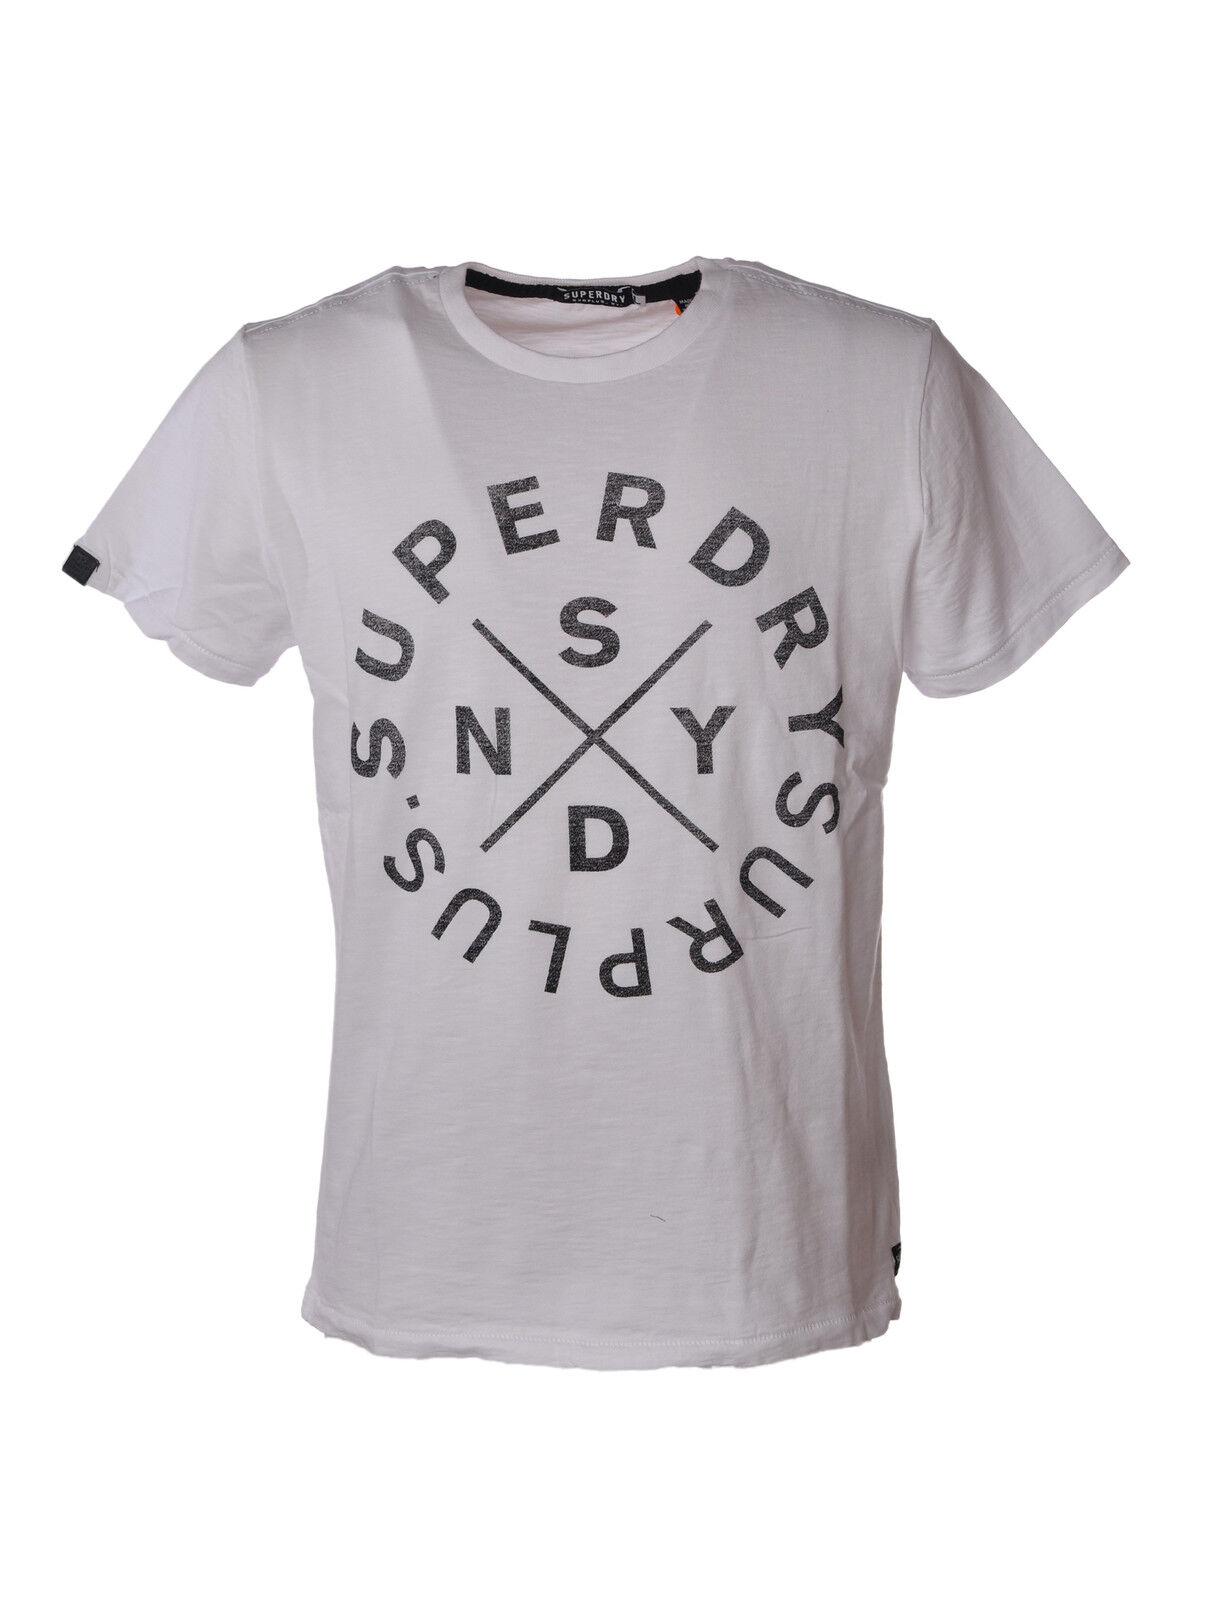 Superdry - Topwear-T-shirts - Man - Weiß - 3488410D190627